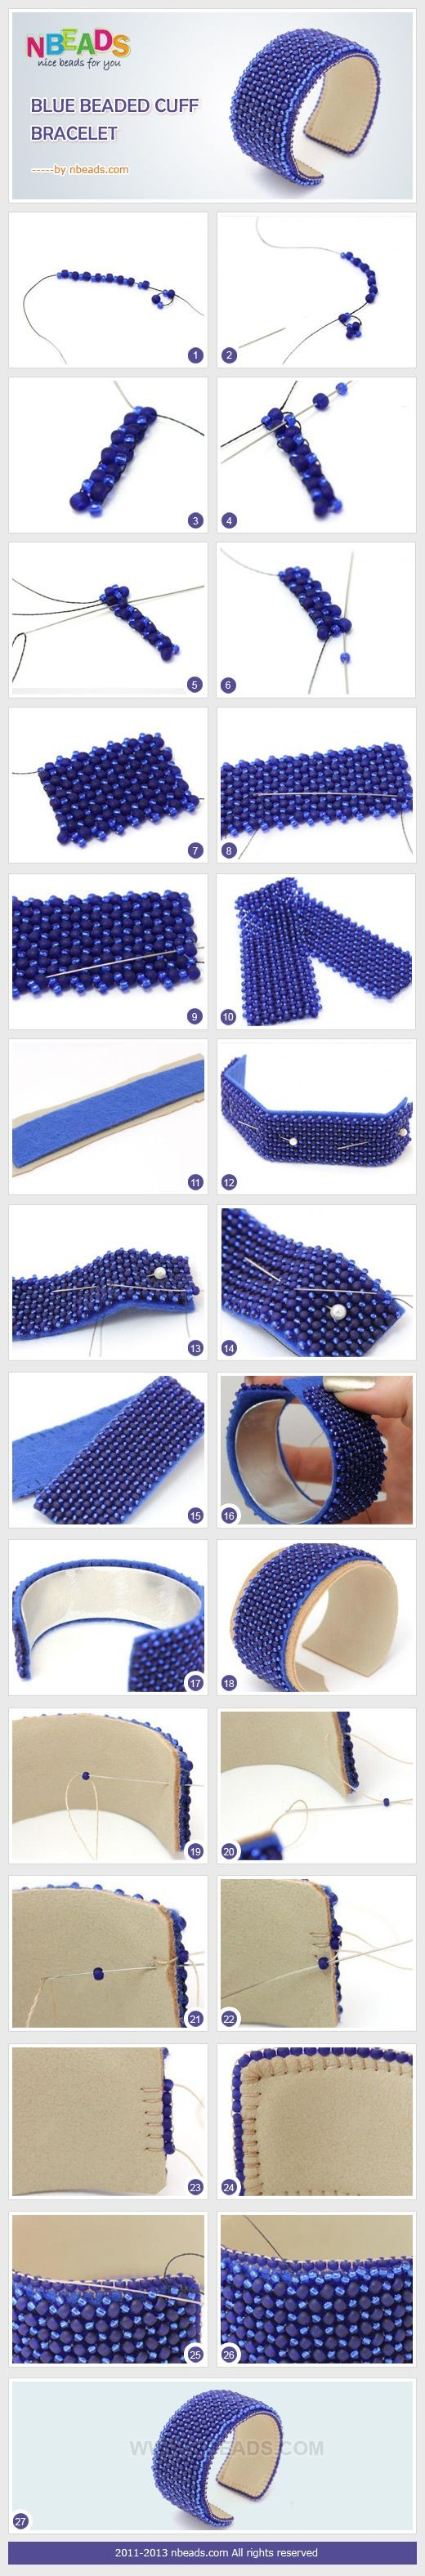 Blue Beaded Cuff Bracelet by Amanda Wong   Project   Jewelry / Accessories   Kollabora